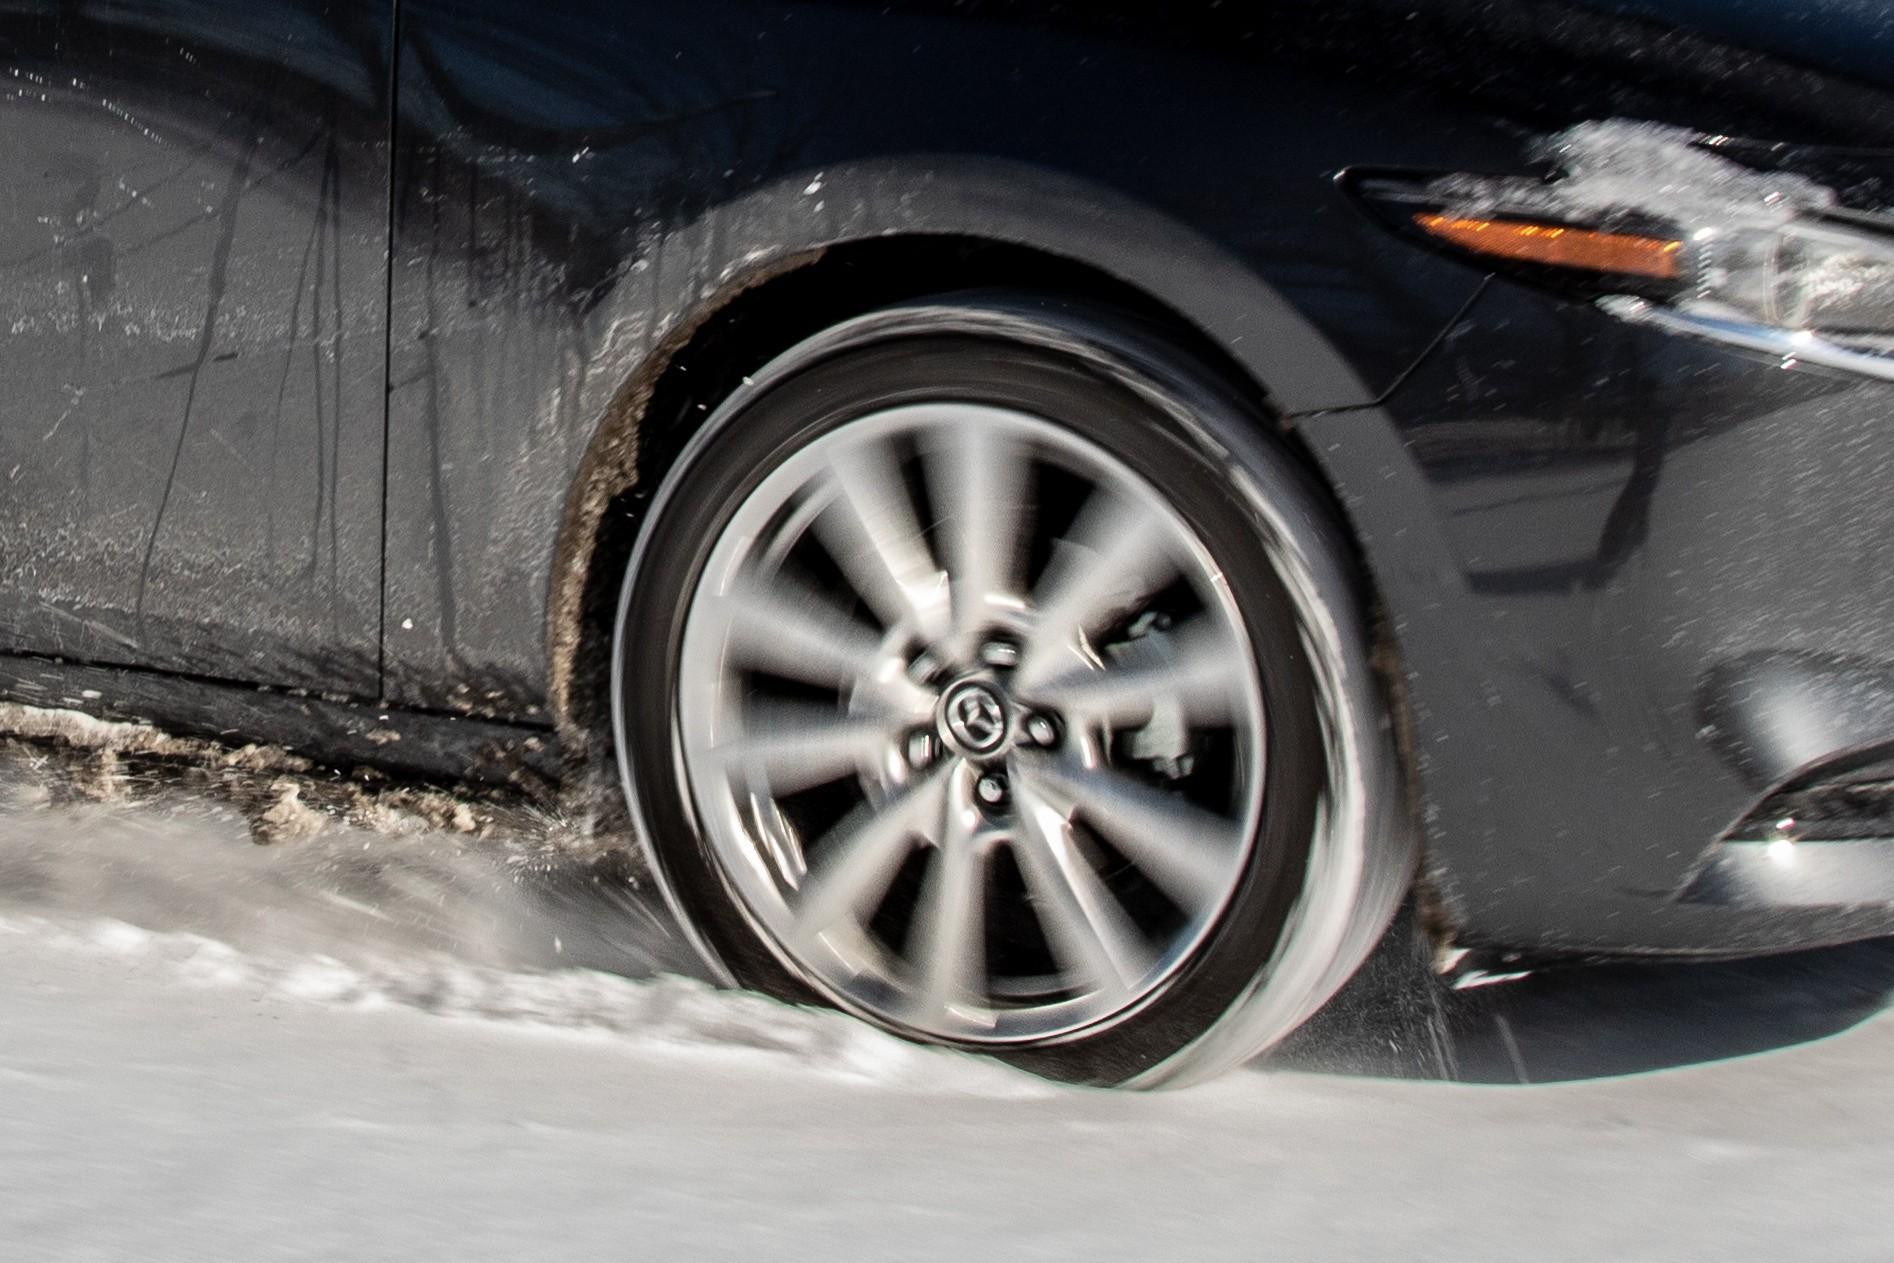 mazda-3-2020-6-dynamic--exterior--grey--snow--wheel.jpg